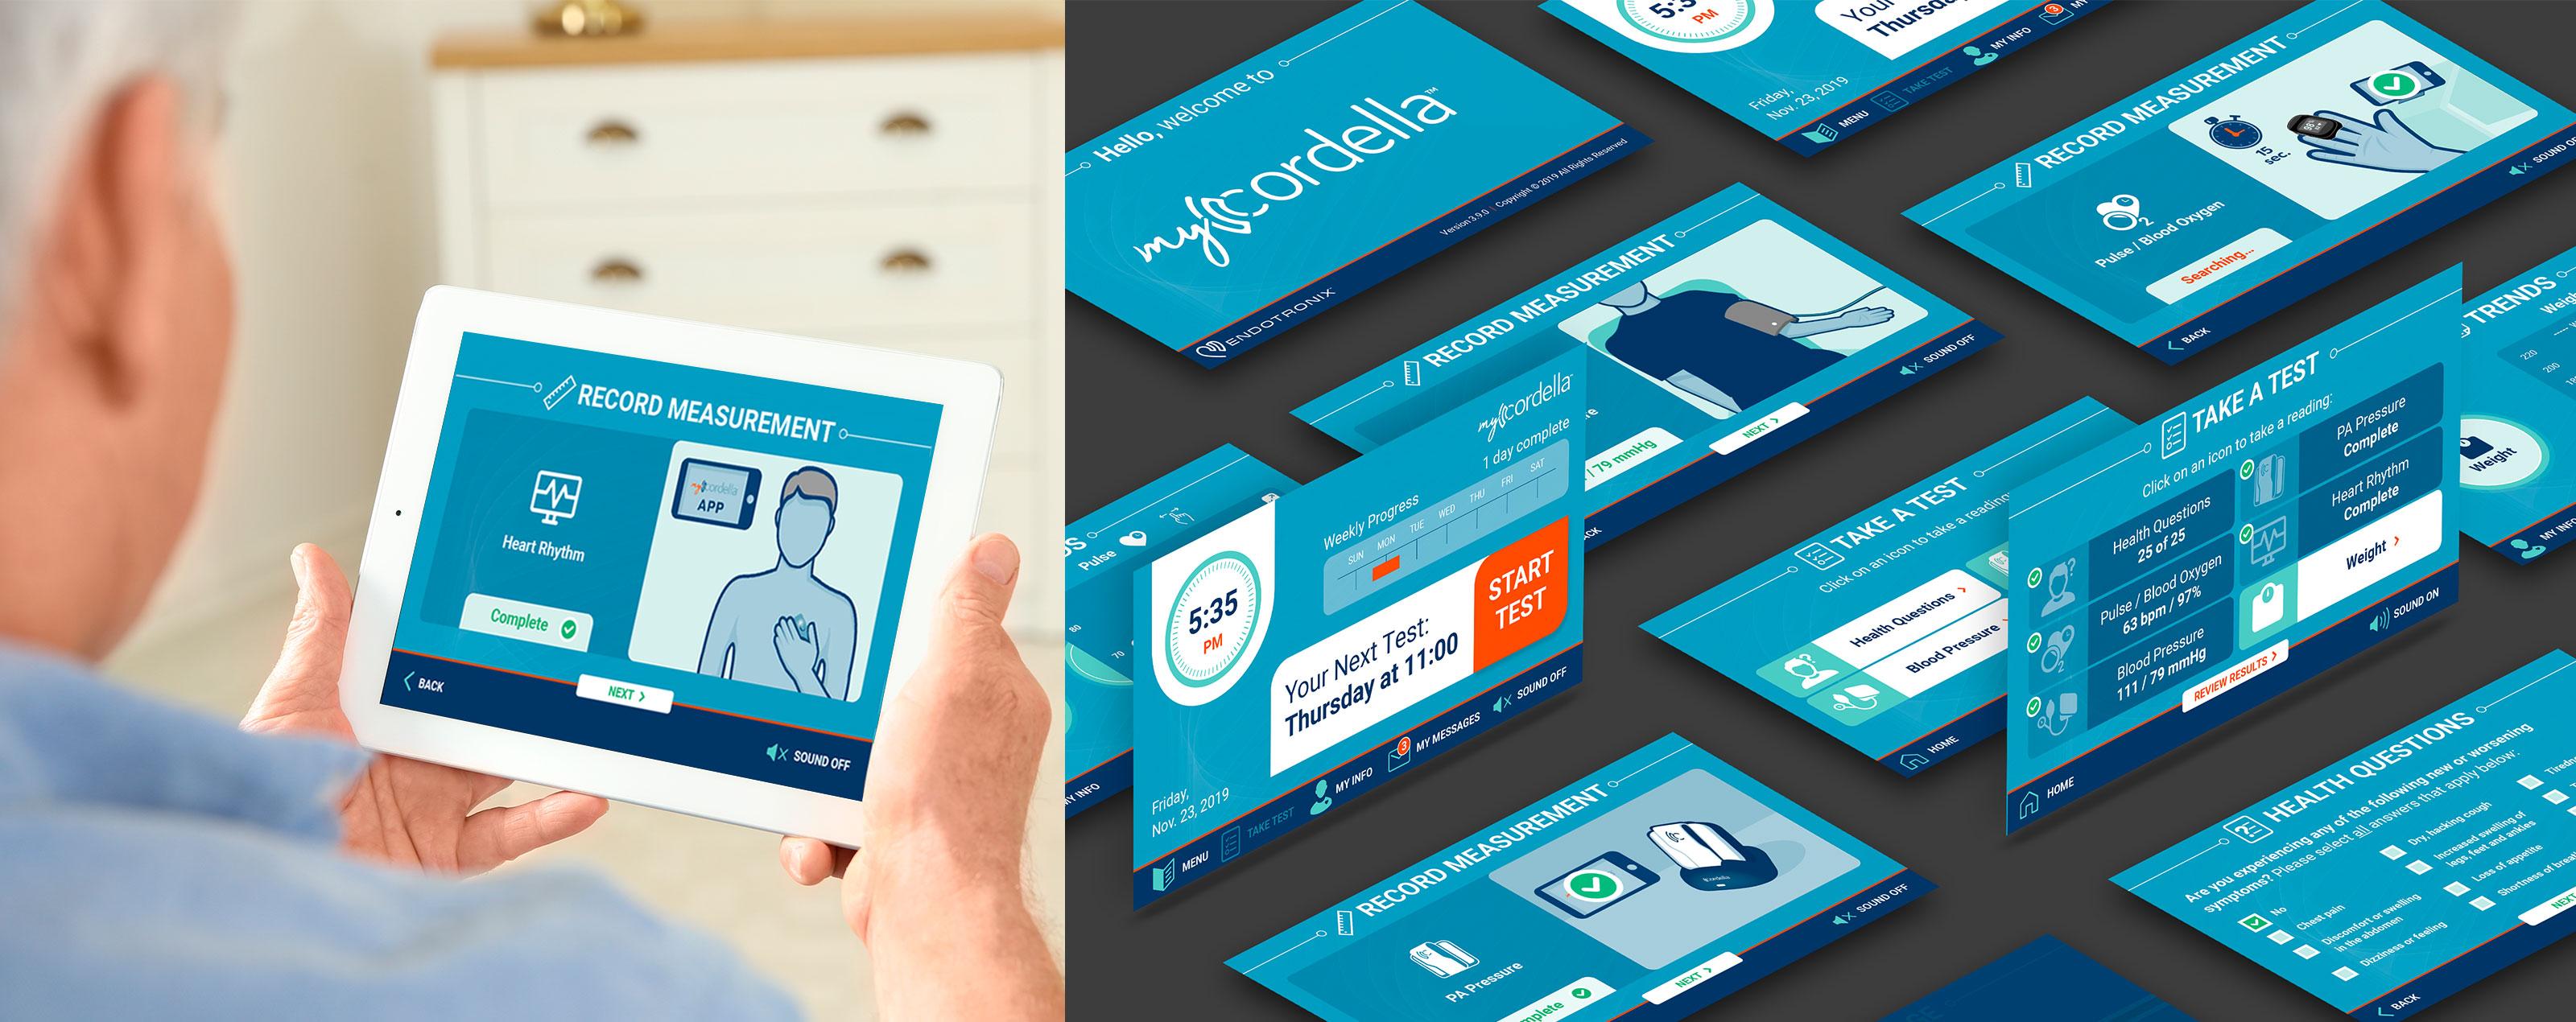 Endotronix Web App